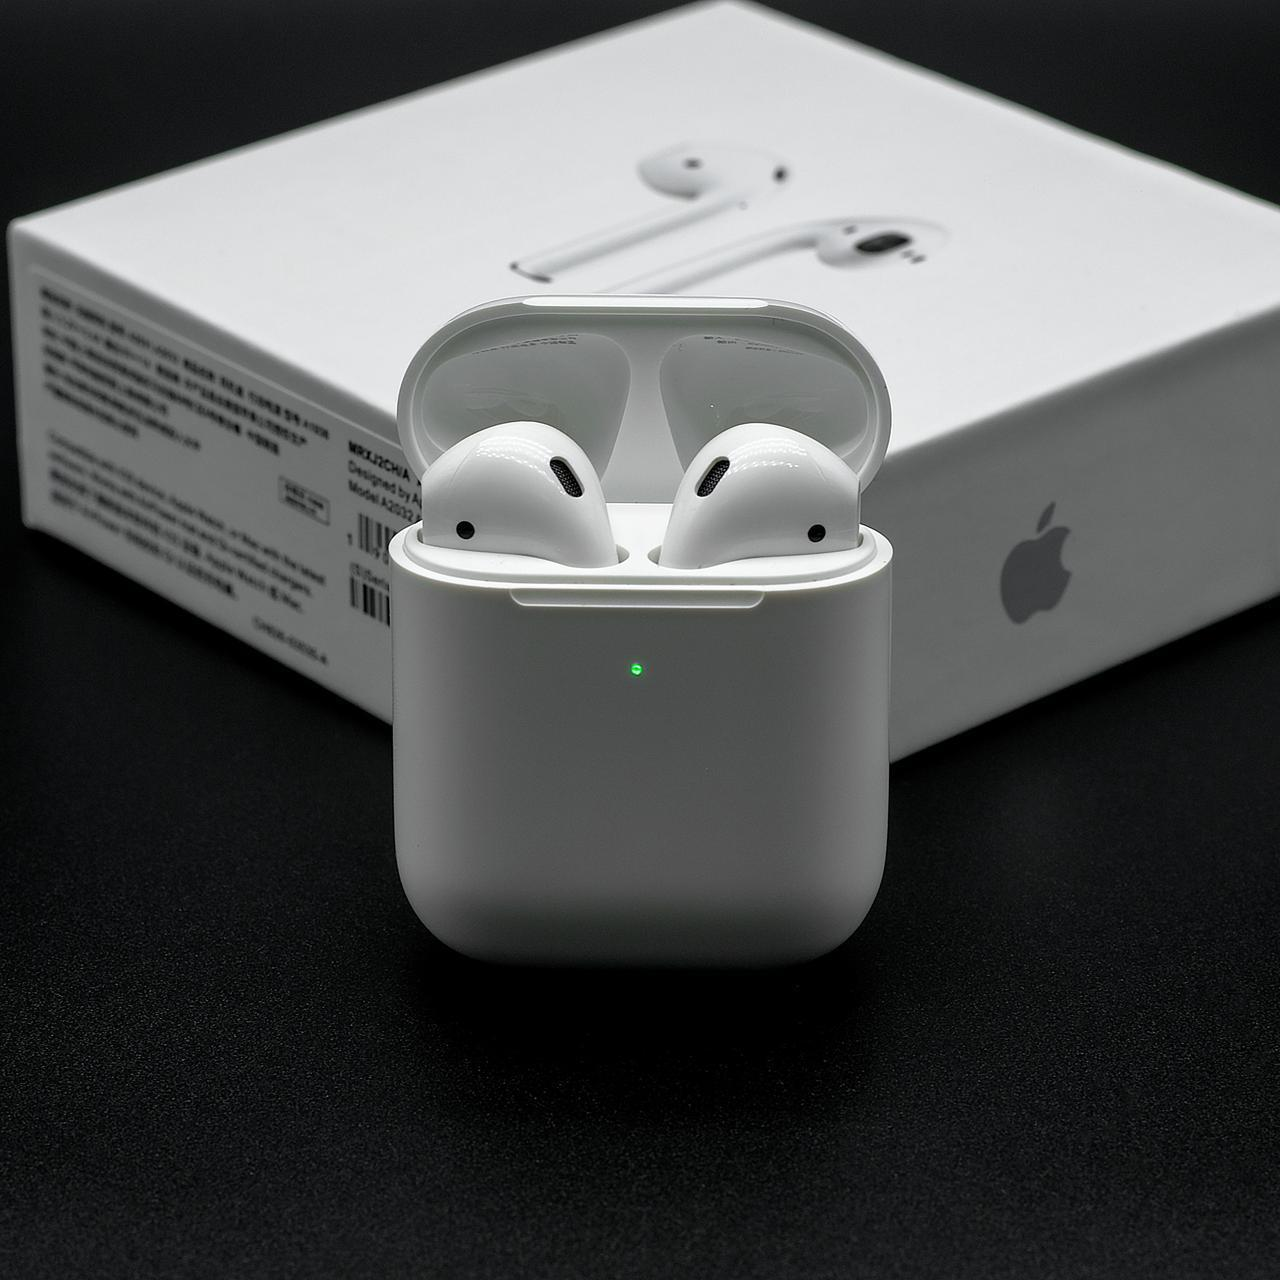 Навушники AirPods 2 Apple AirPods 2 з бездротовою зарядкою (  класу люкс)